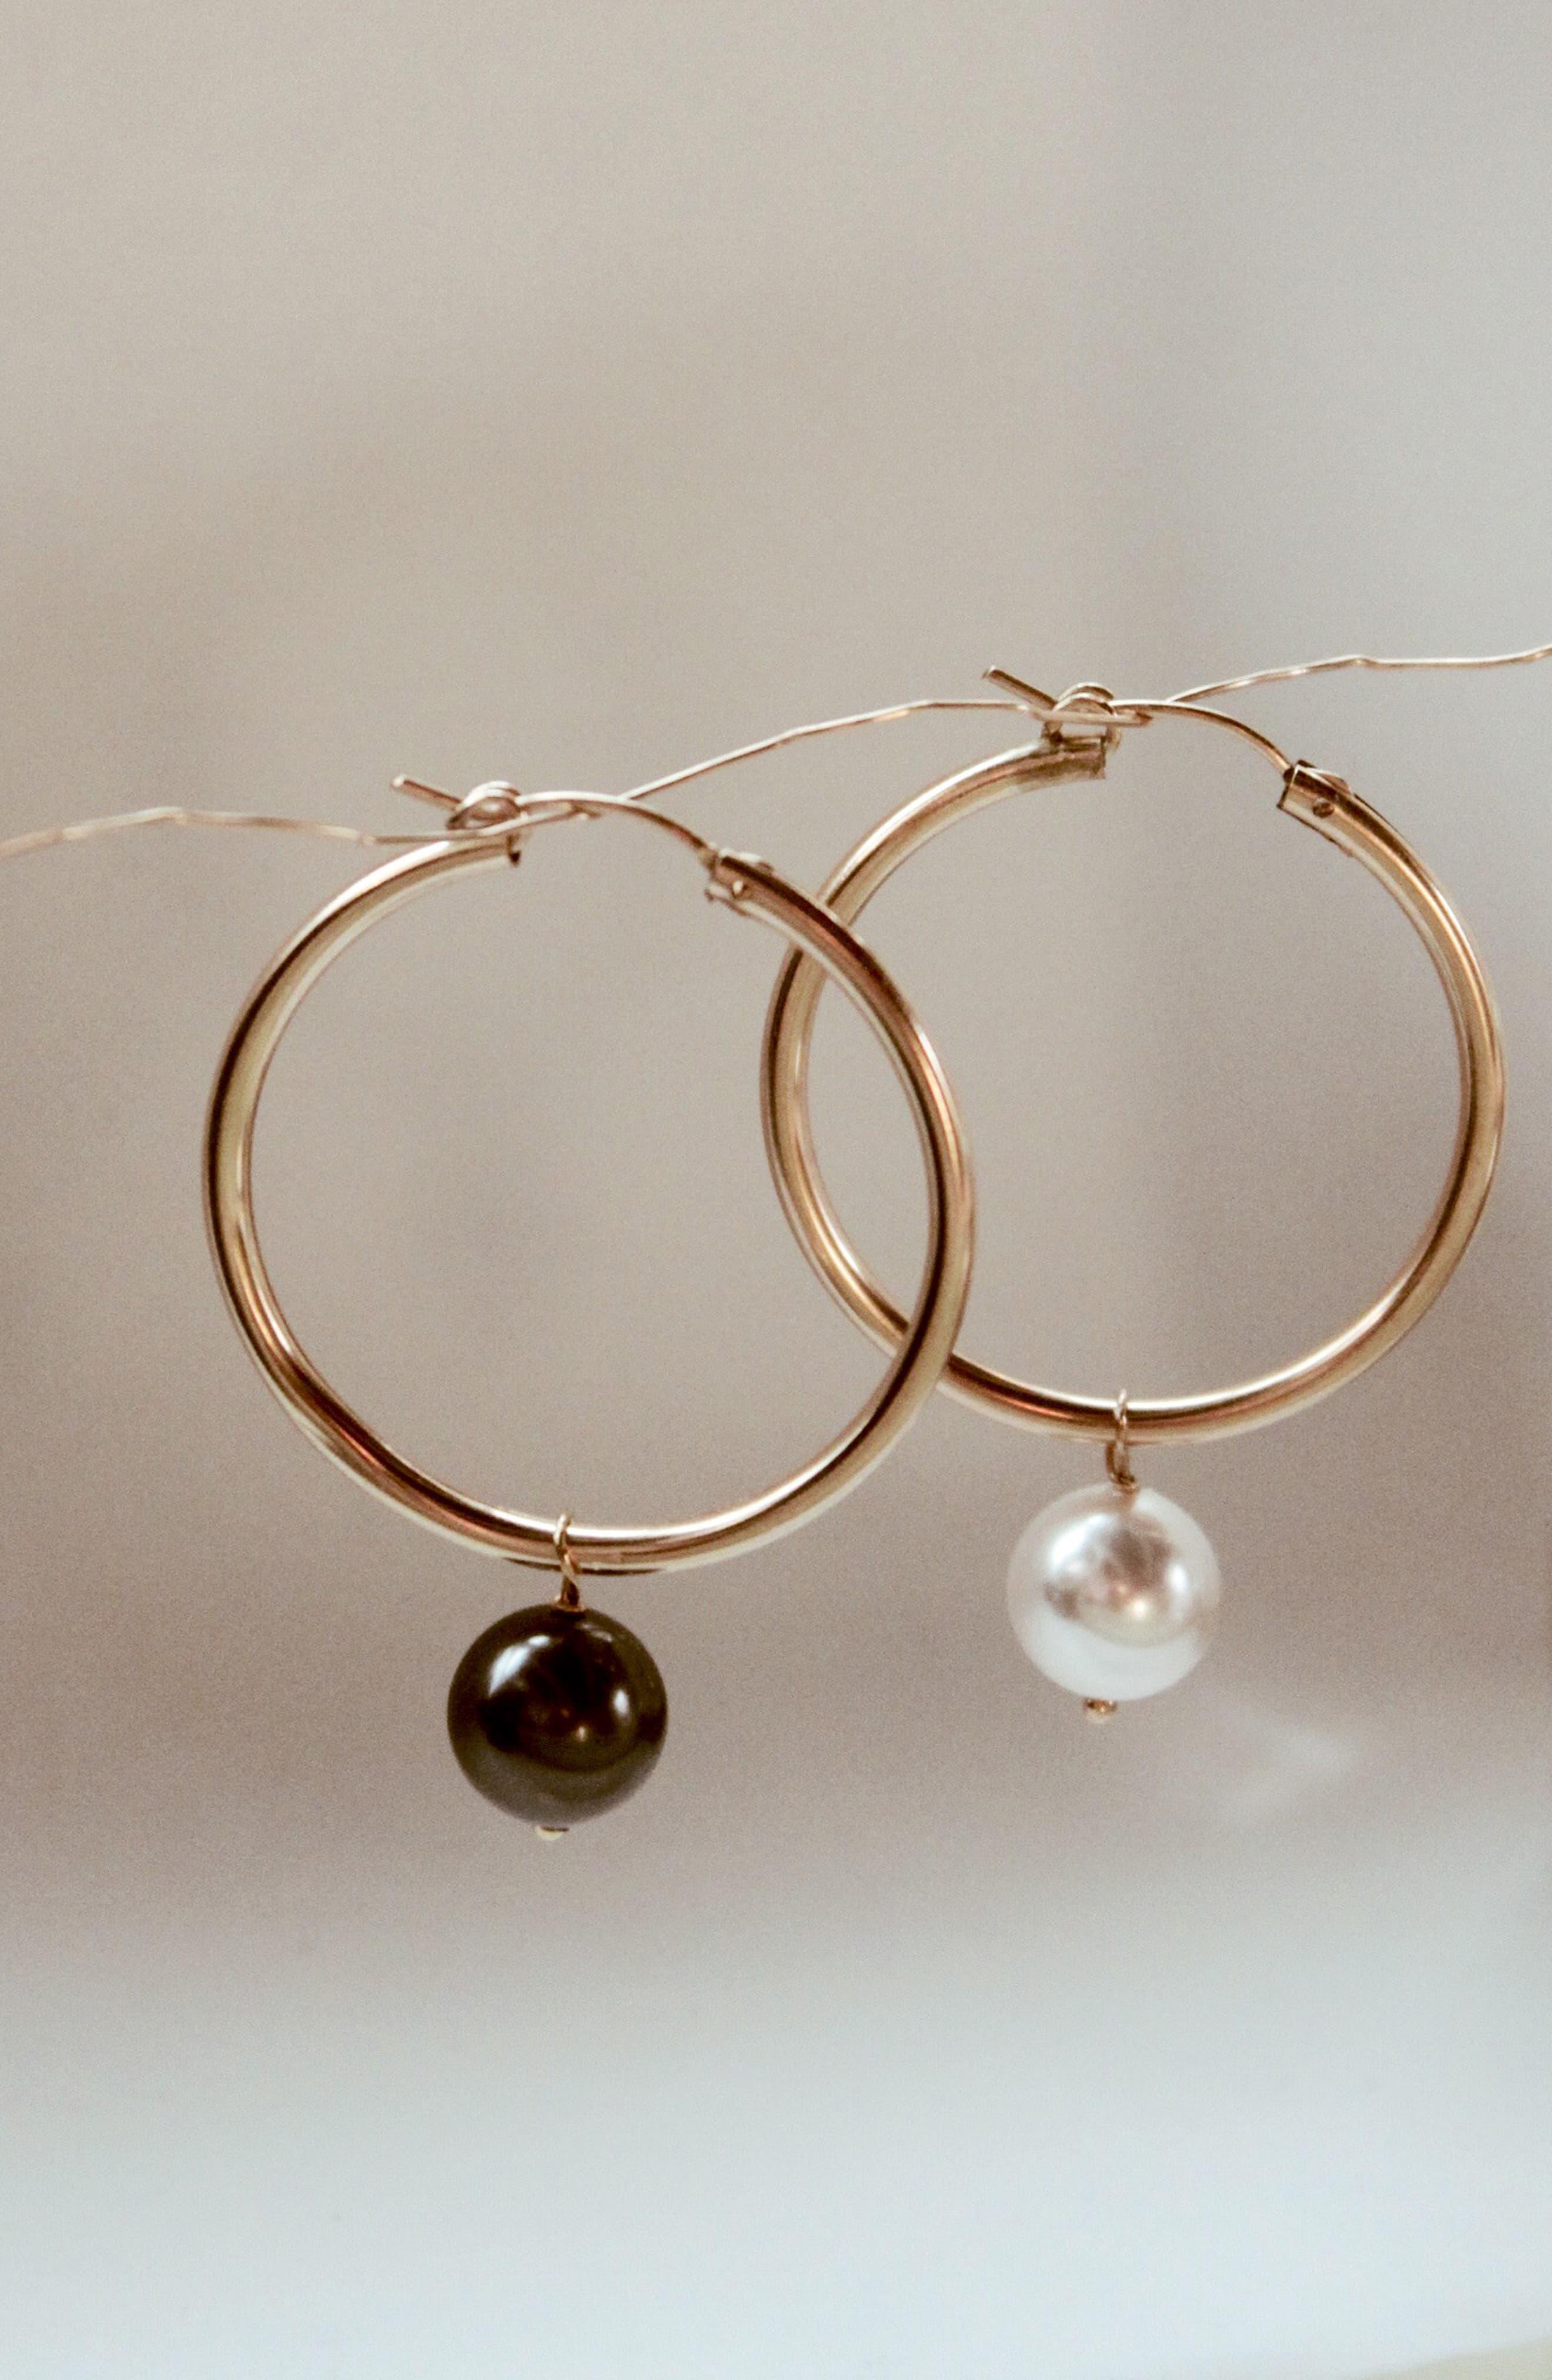 Agra Mismatched Swarovski Imitation Pearl Hoop Earrings,                             Alternate thumbnail 3, color,                             WHITE PEARL BLACK PEARL